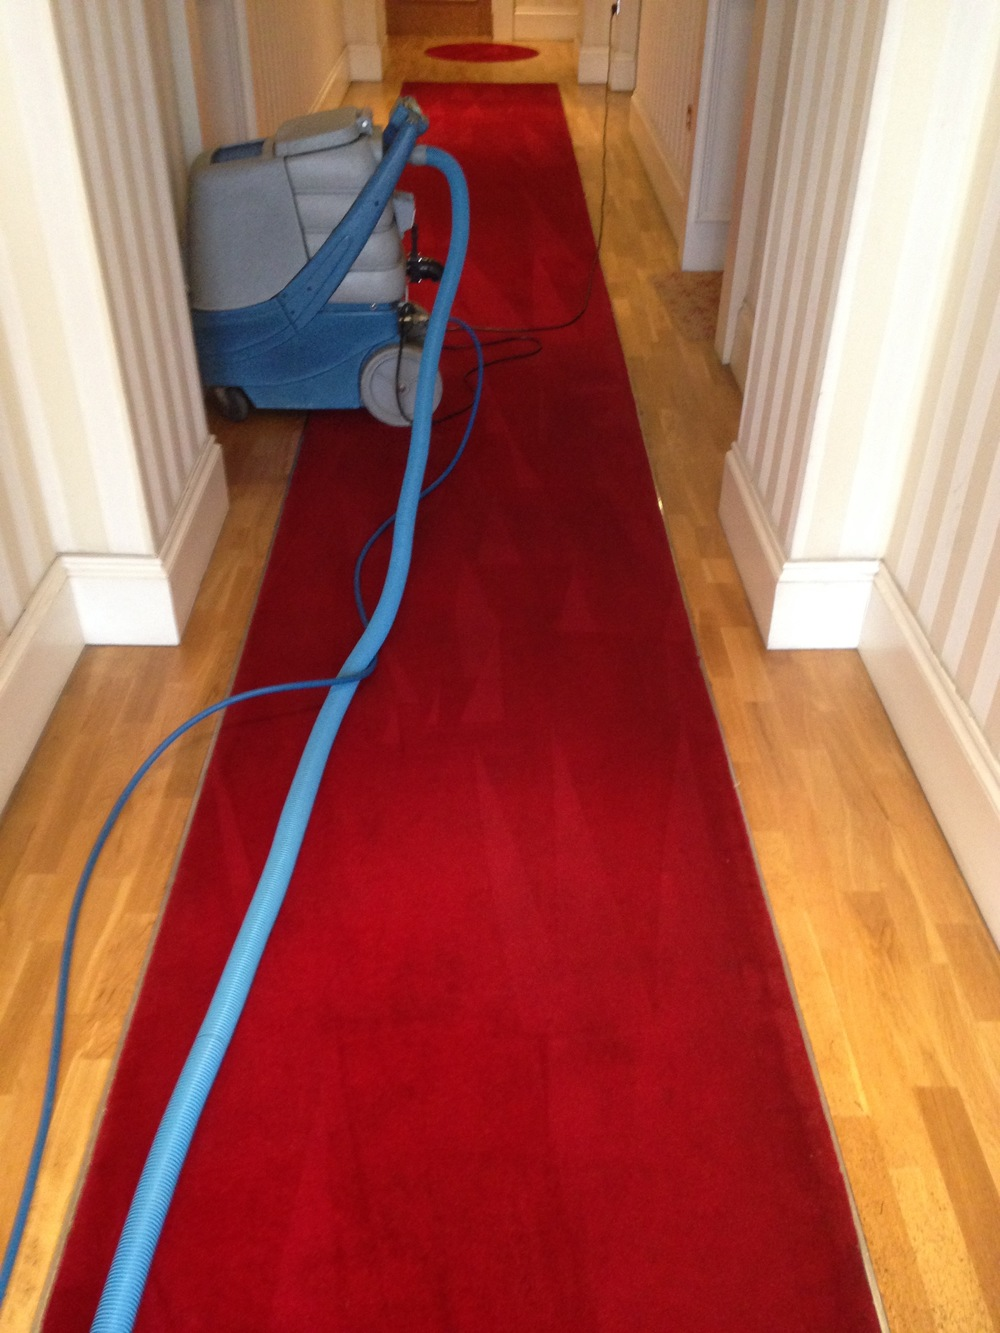 communal hallway carpet cleaning.jpg